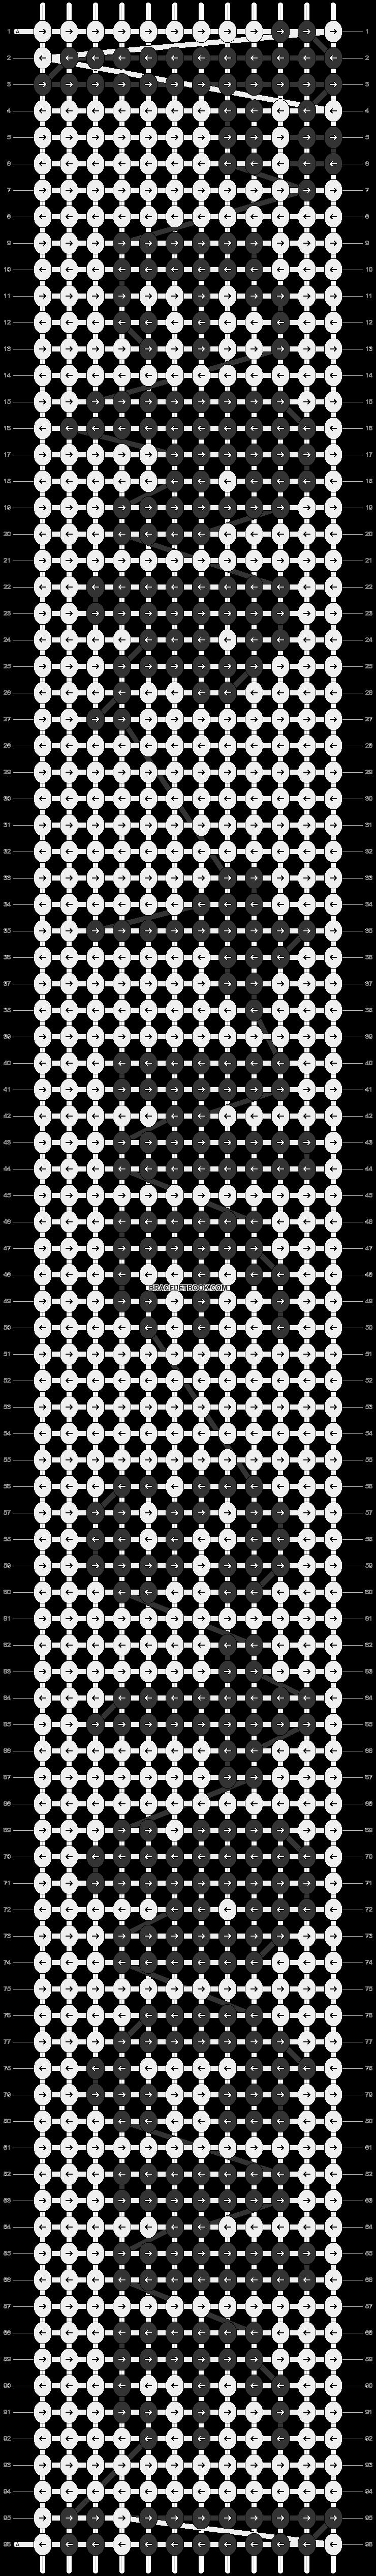 Alpha pattern #3340 pattern